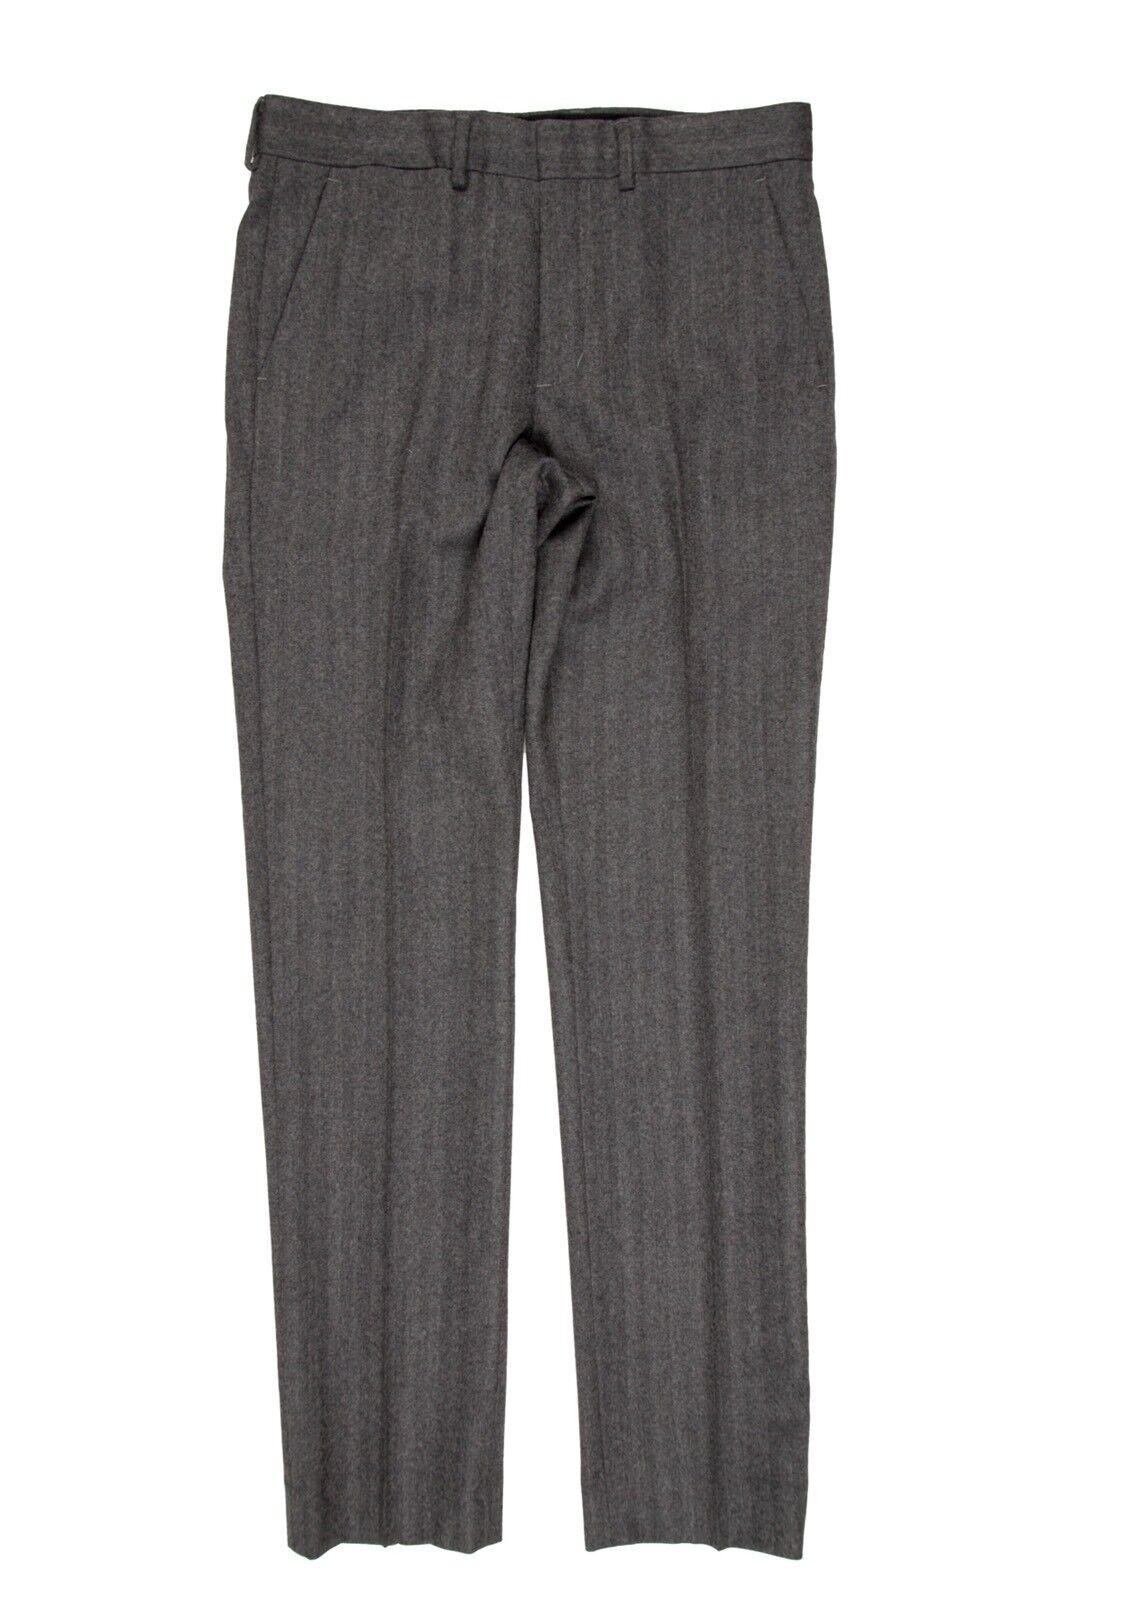 VINCE Men's Straight Fit Dress Pants Retail   (NWT)